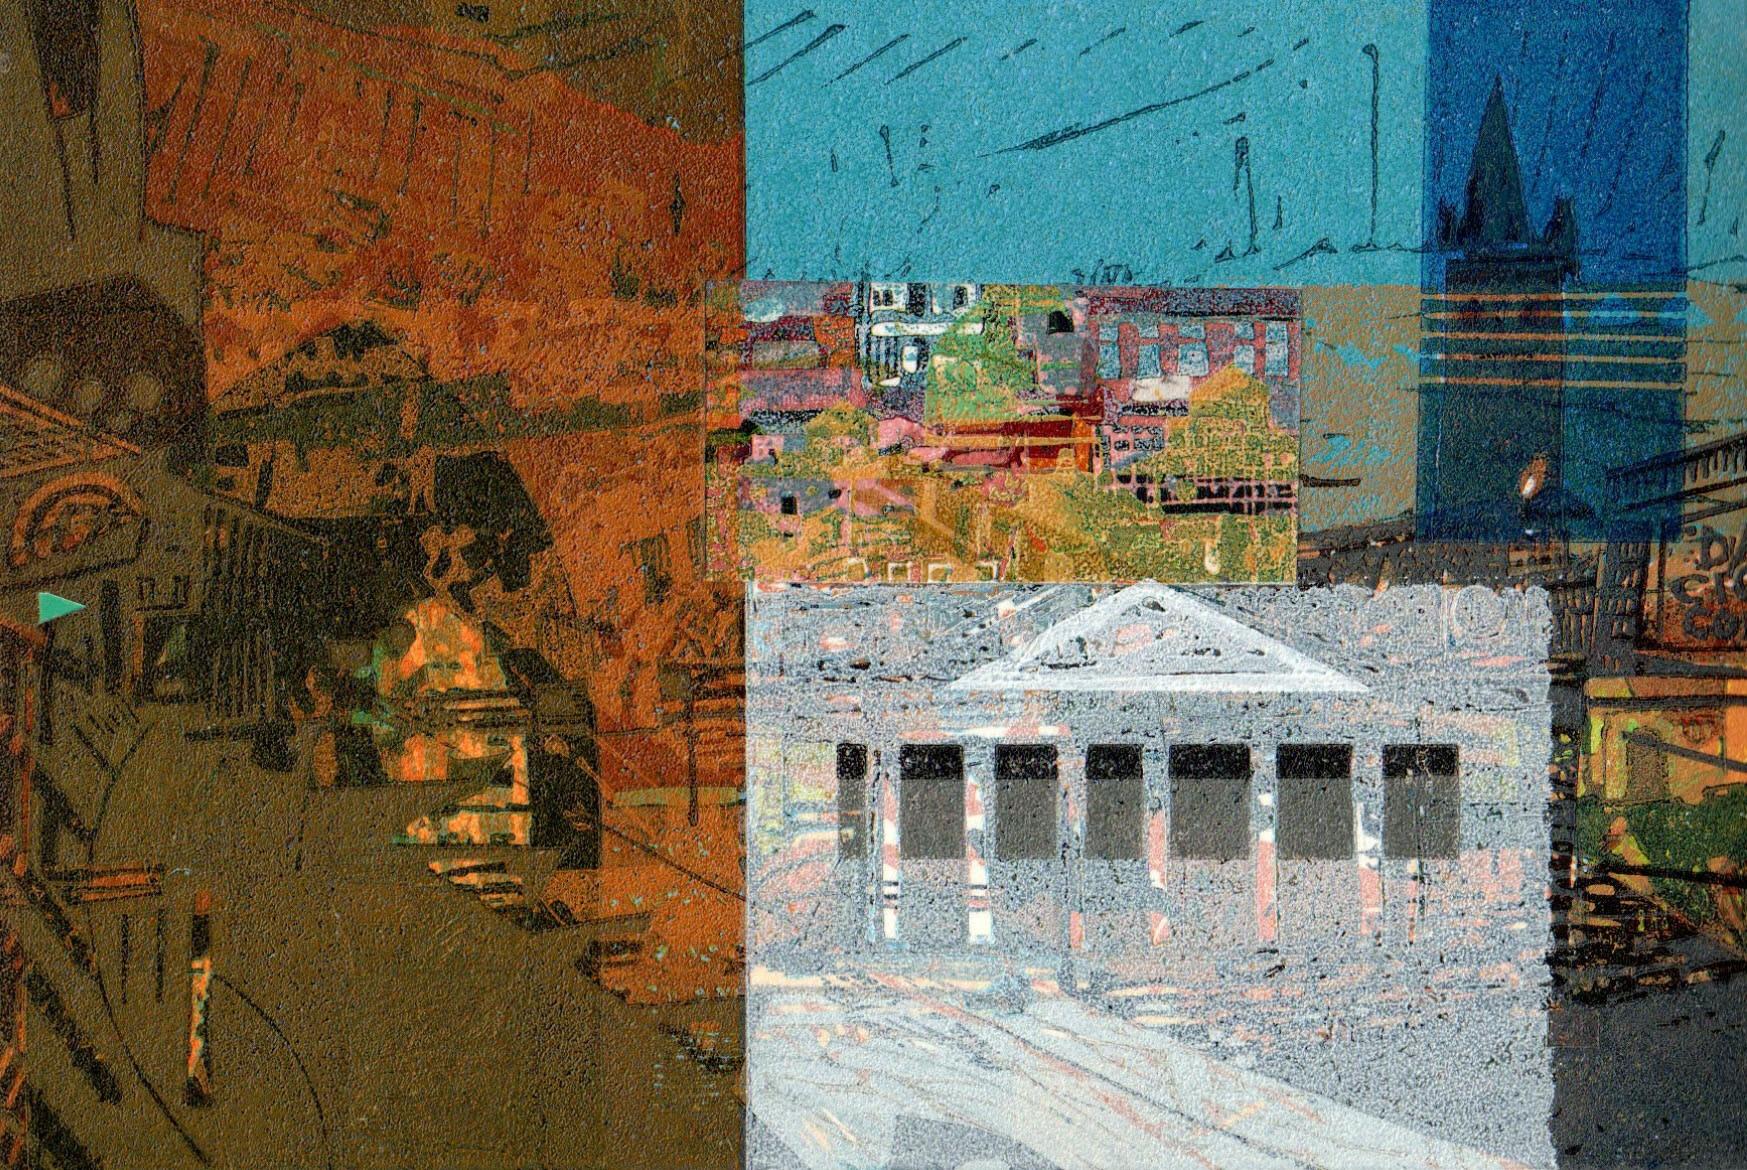 <span class=&#34;link fancybox-details-link&#34;><a href=&#34;/artists/132-roy-willingham-re/works/9831/&#34;>View Detail Page</a></span><div class=&#34;artist&#34;><span class=&#34;artist&#34;><strong>Roy Willingham RE</strong></span></div><div class=&#34;title&#34;><em>Travelogue No8 Recondito Ad Ogni Ora</em></div><div class=&#34;medium&#34;>linocut</div>